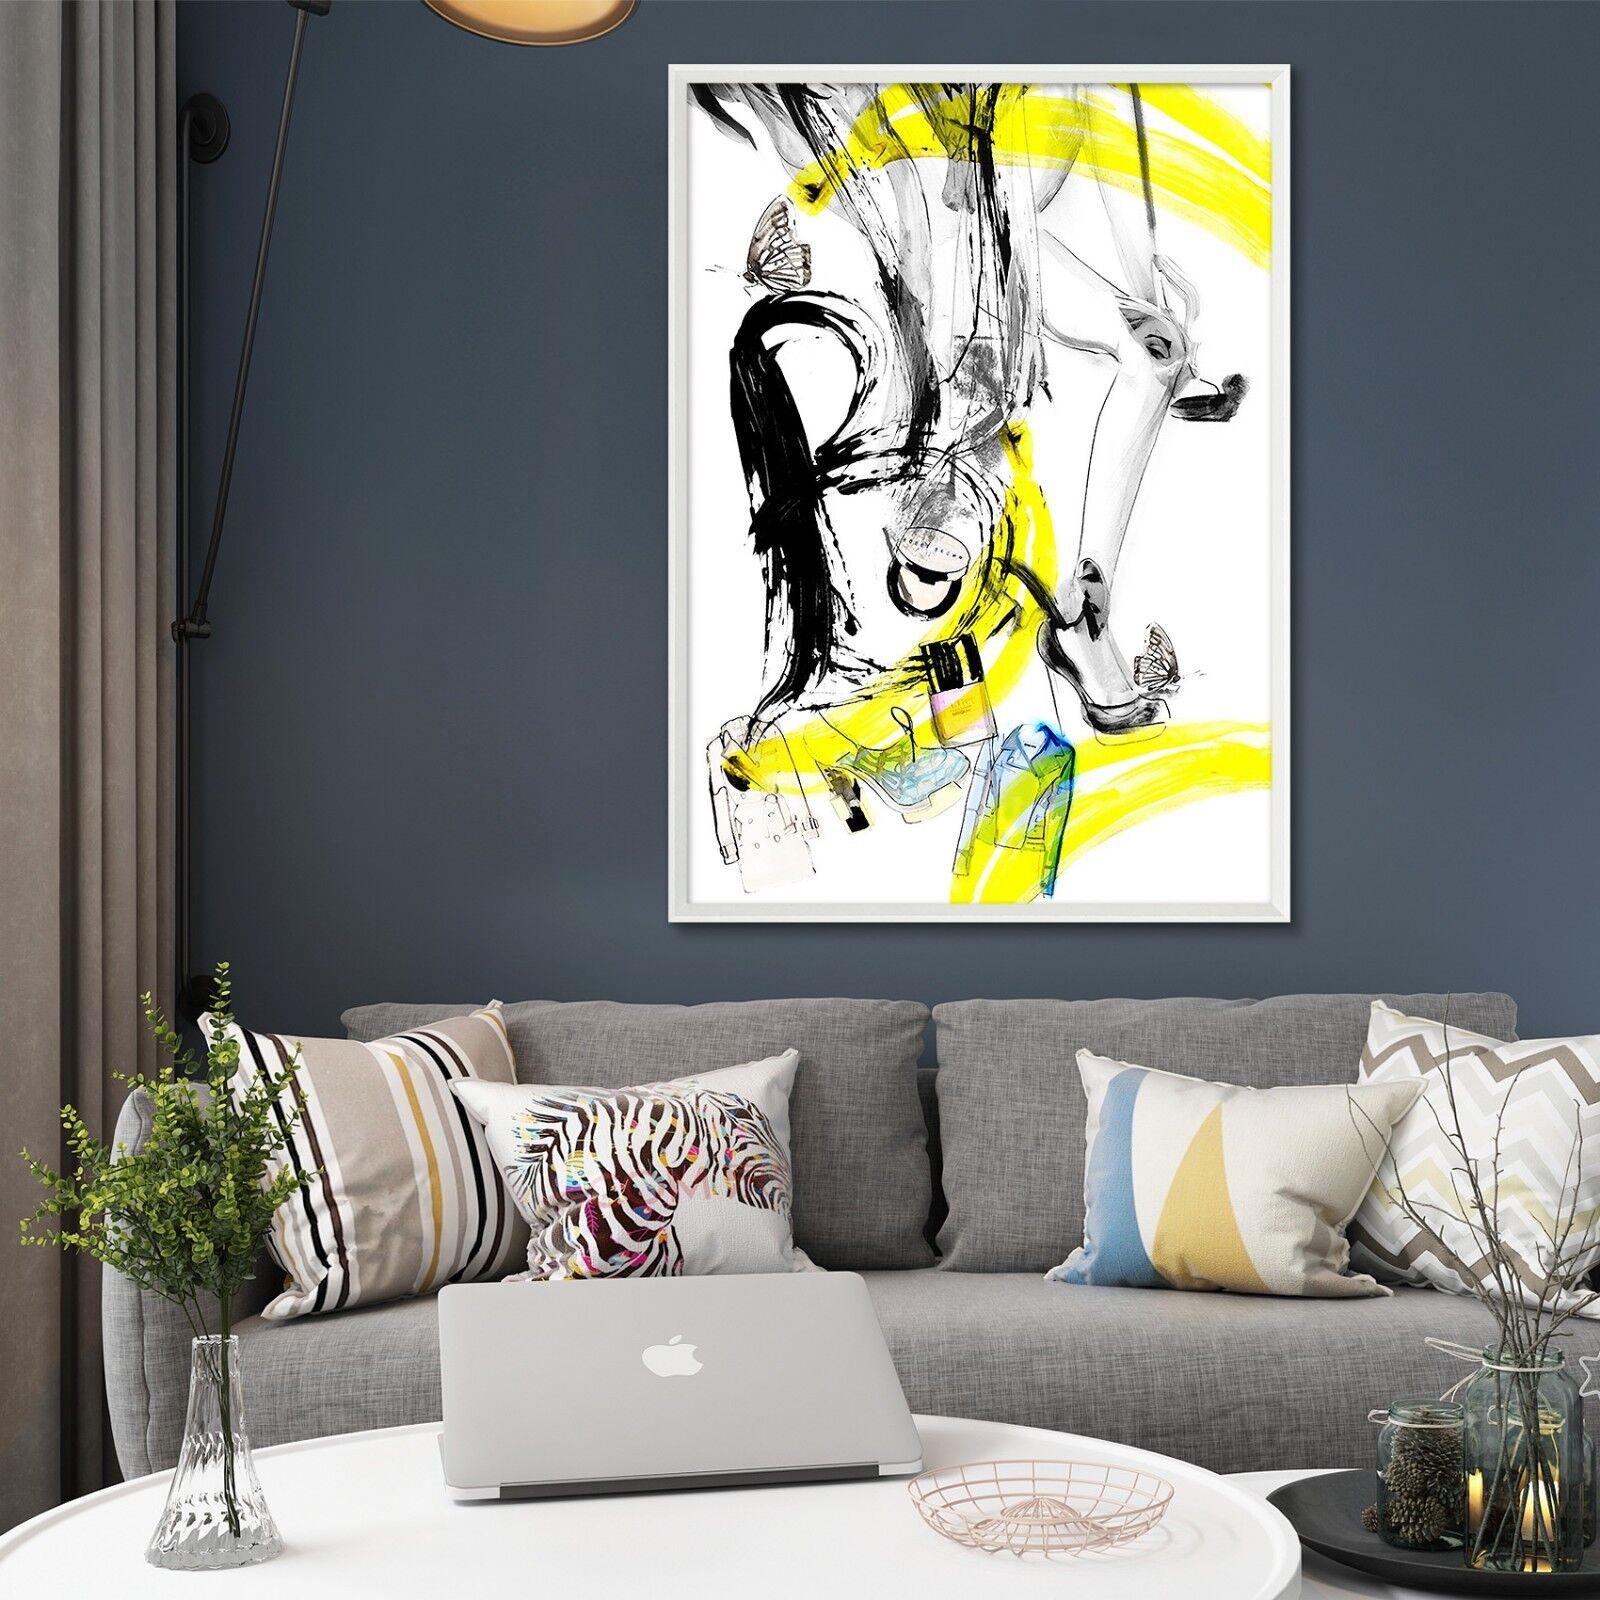 3D Negro Amarillo Graffiti 3 Enmarcado Cartel Decoración del Hogar Pintura de Impresión Arte Wallpaper